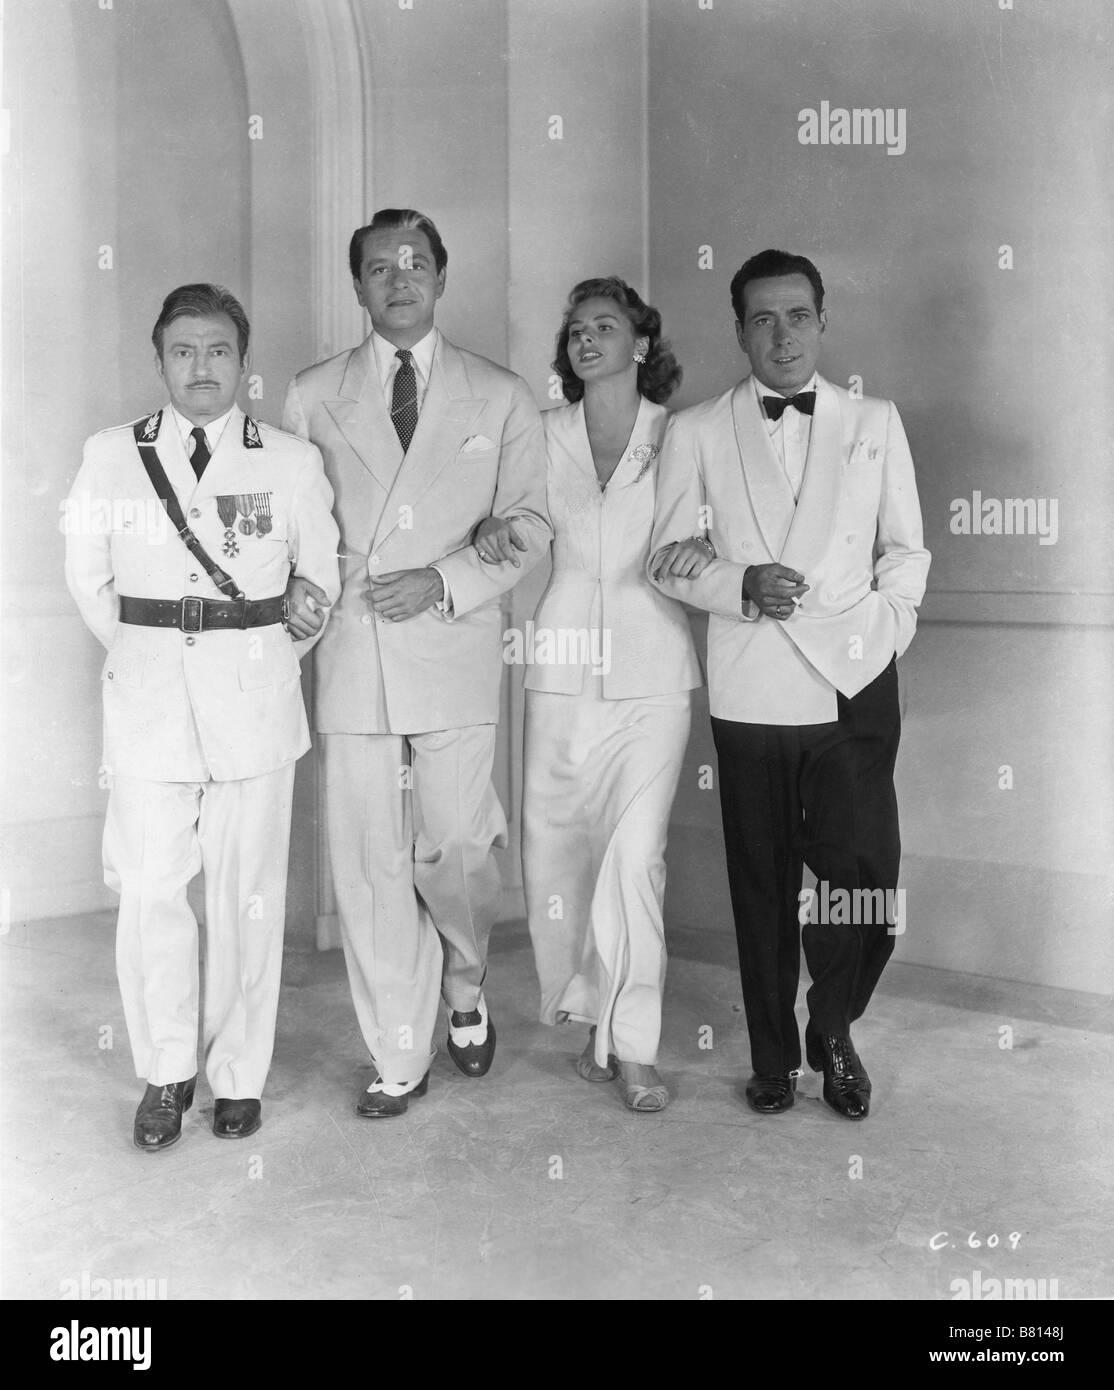 Casablanca  Year : 1942 USA Humphrey Bogart, Ingrid Bergman, Paul Henreid, Claude Rains  Director: Michael Curtiz - Stock Image